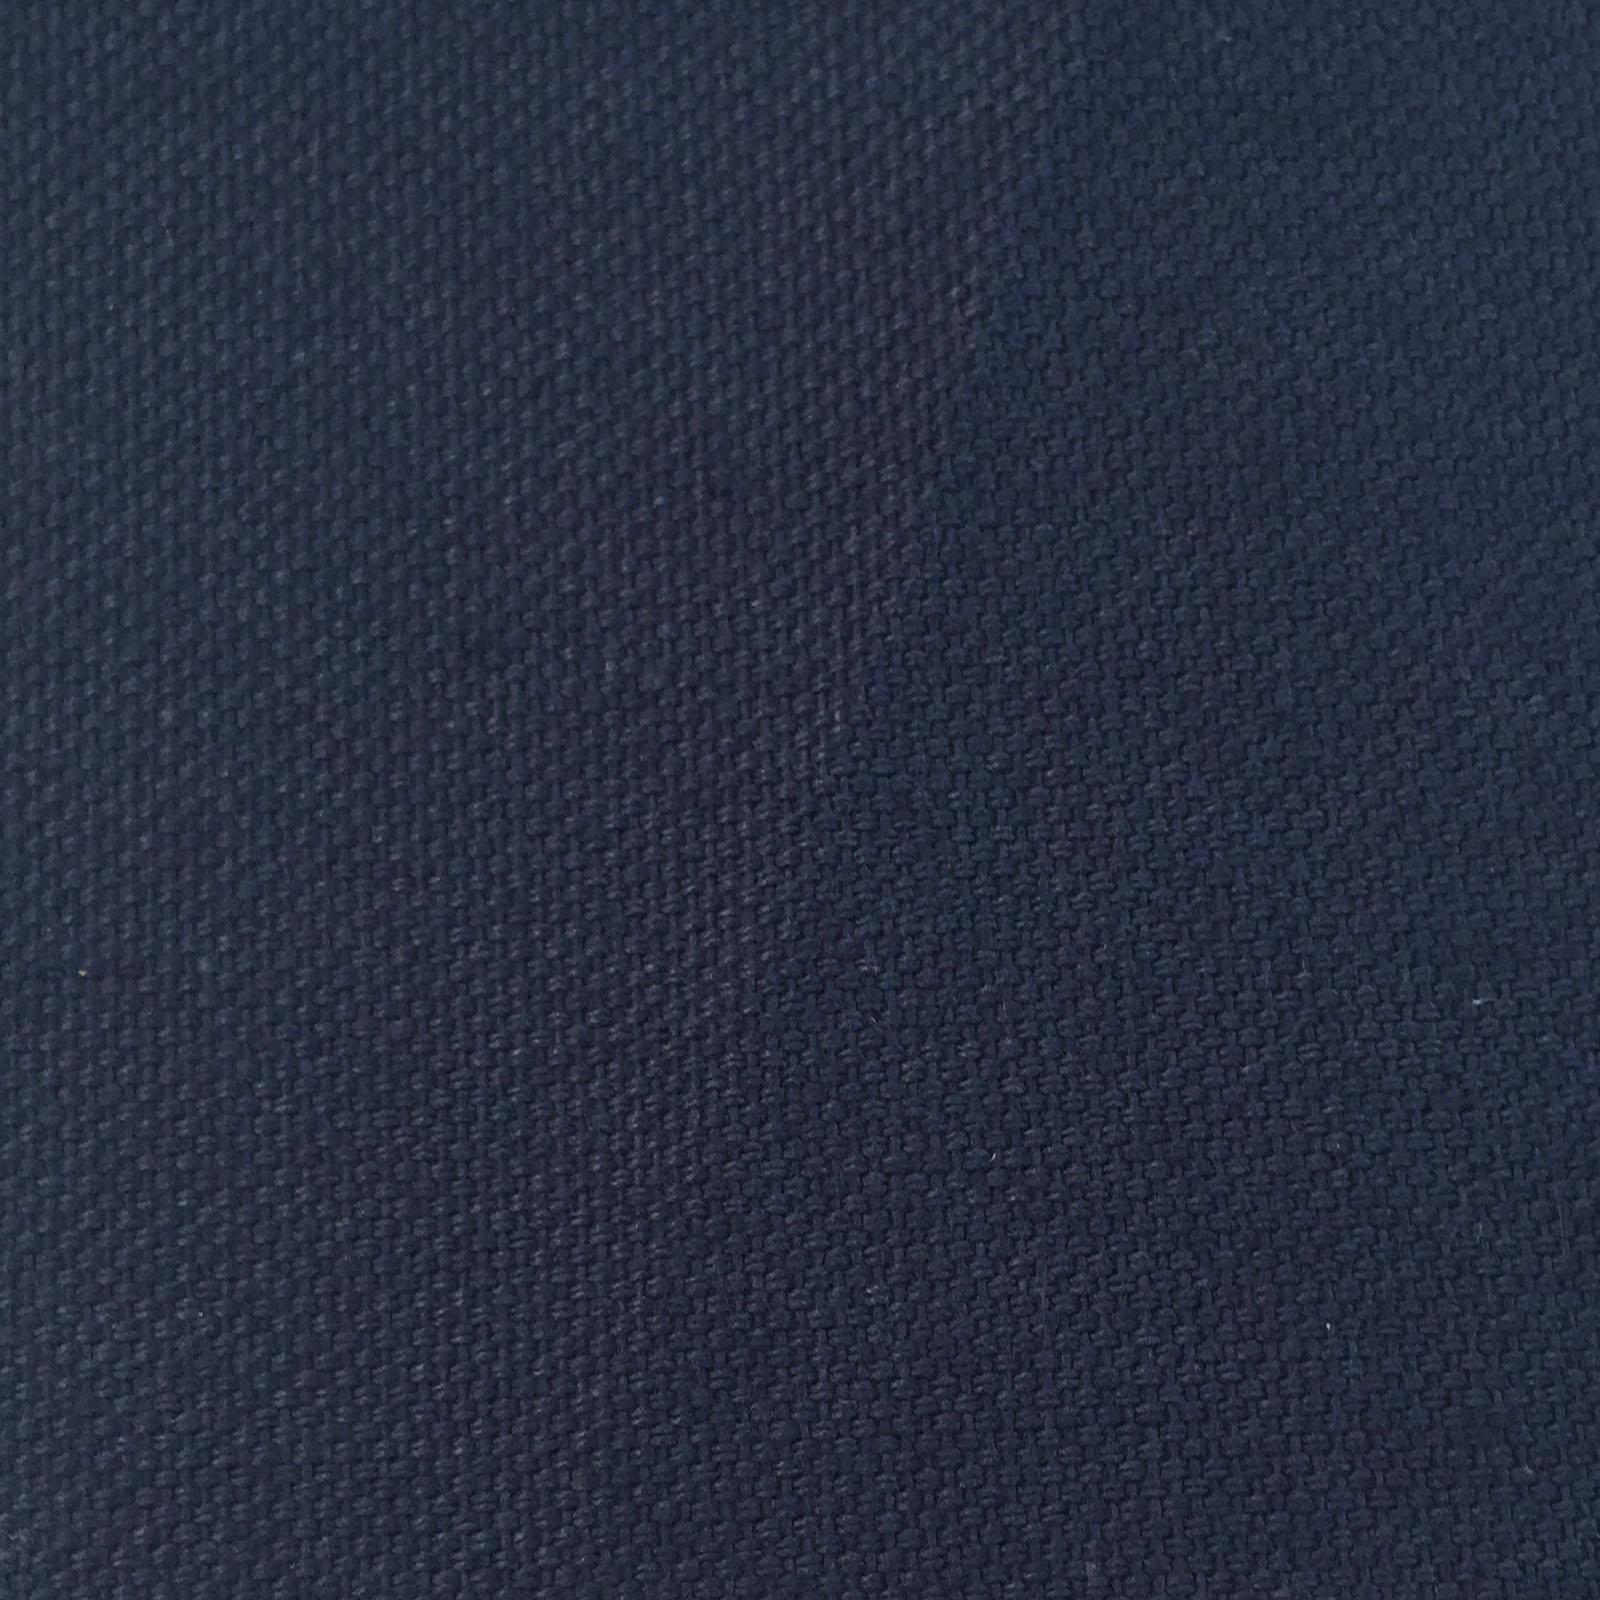 Navy Blue 10 Oz Canvas Dropcloth Chicago Canvas Amp Supply